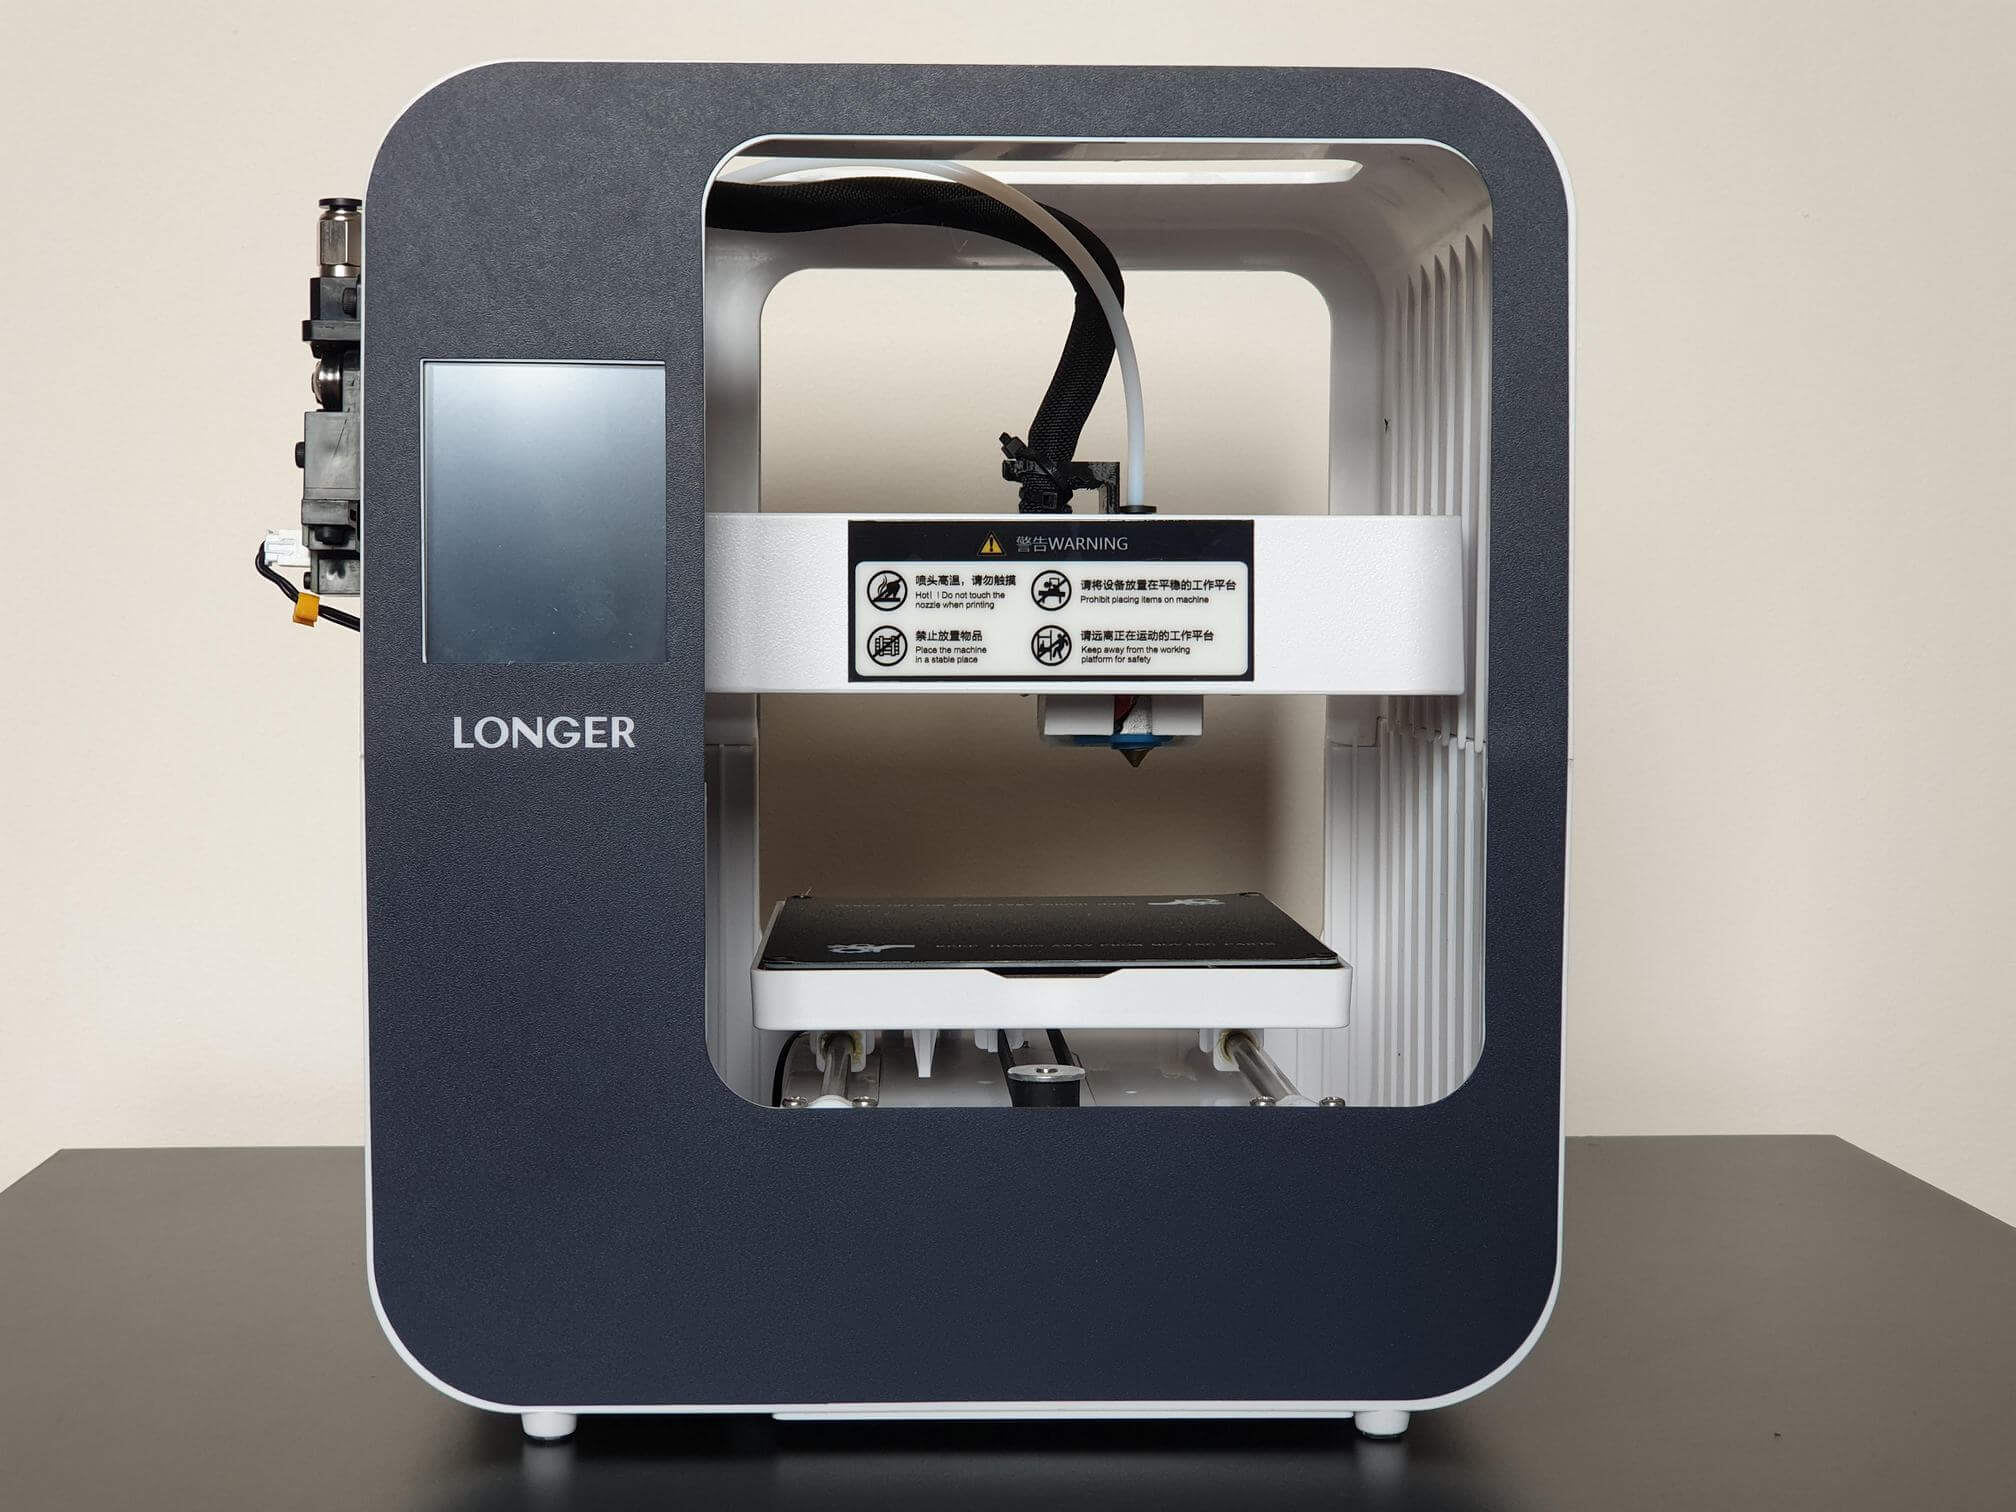 Longer 2 Mini Design 2 | Cube2 Mini Review - 3D Printer for Kids